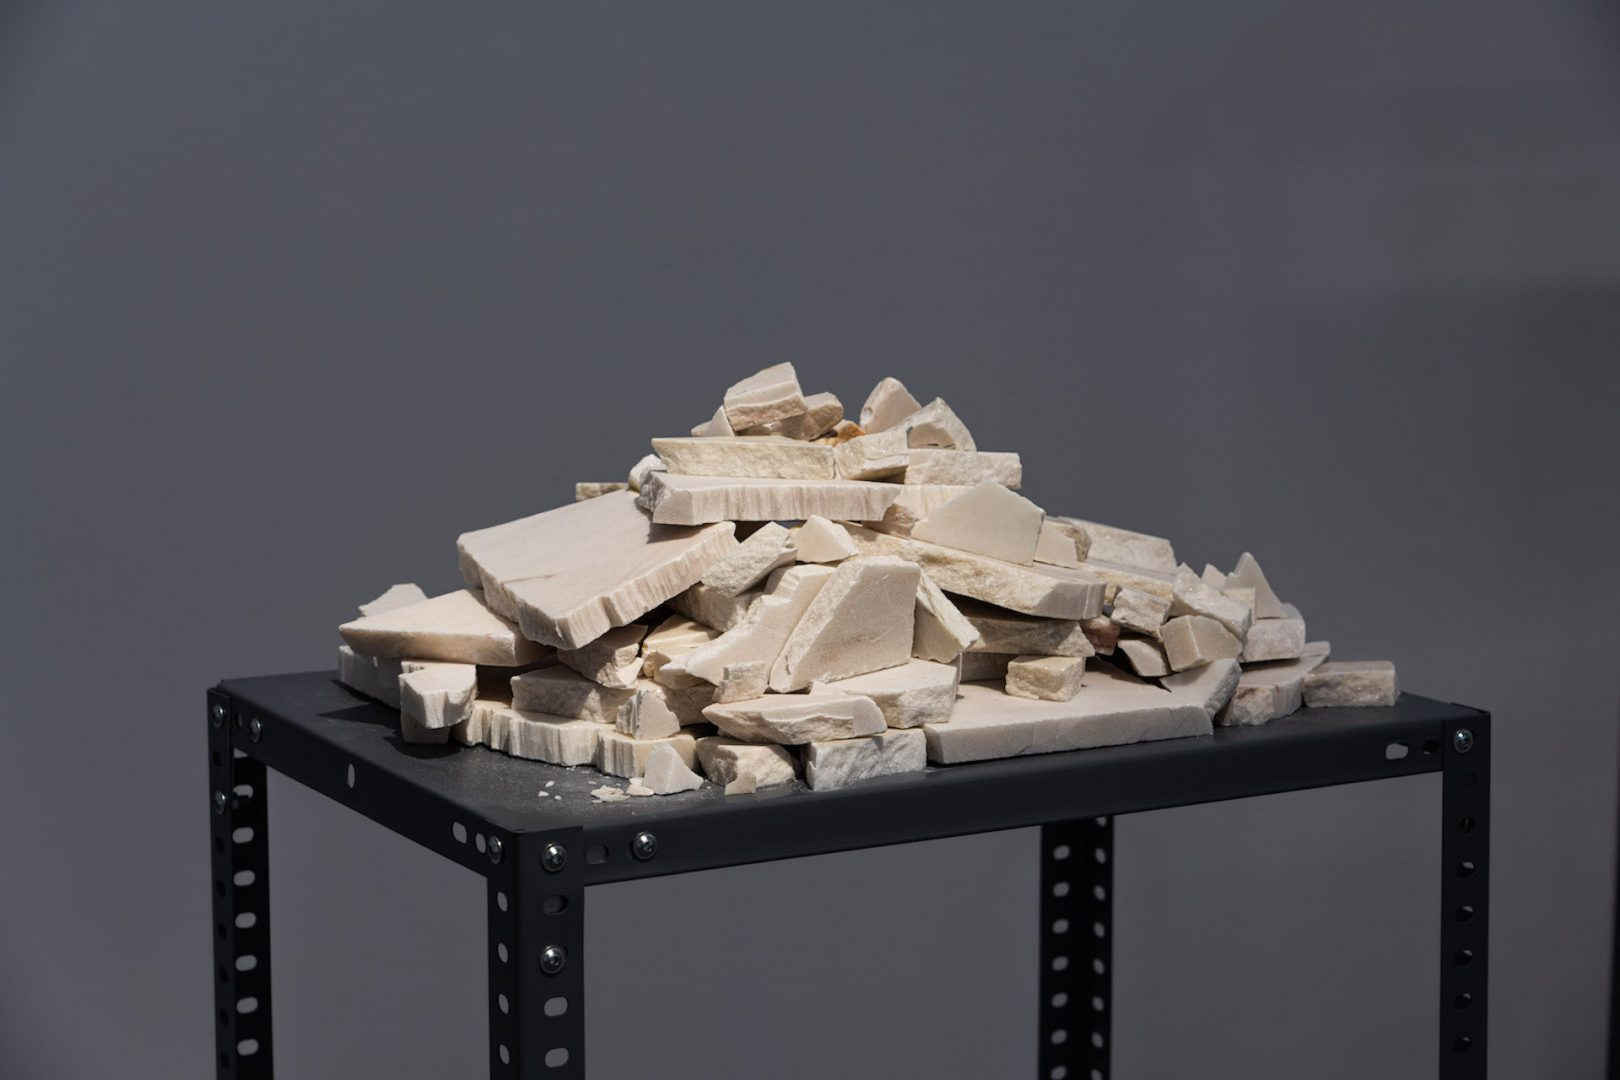 Talya Lubinsky, Exhibition View, Marble Dust, Künstlerhaus Bethanien, Berlin, 2020